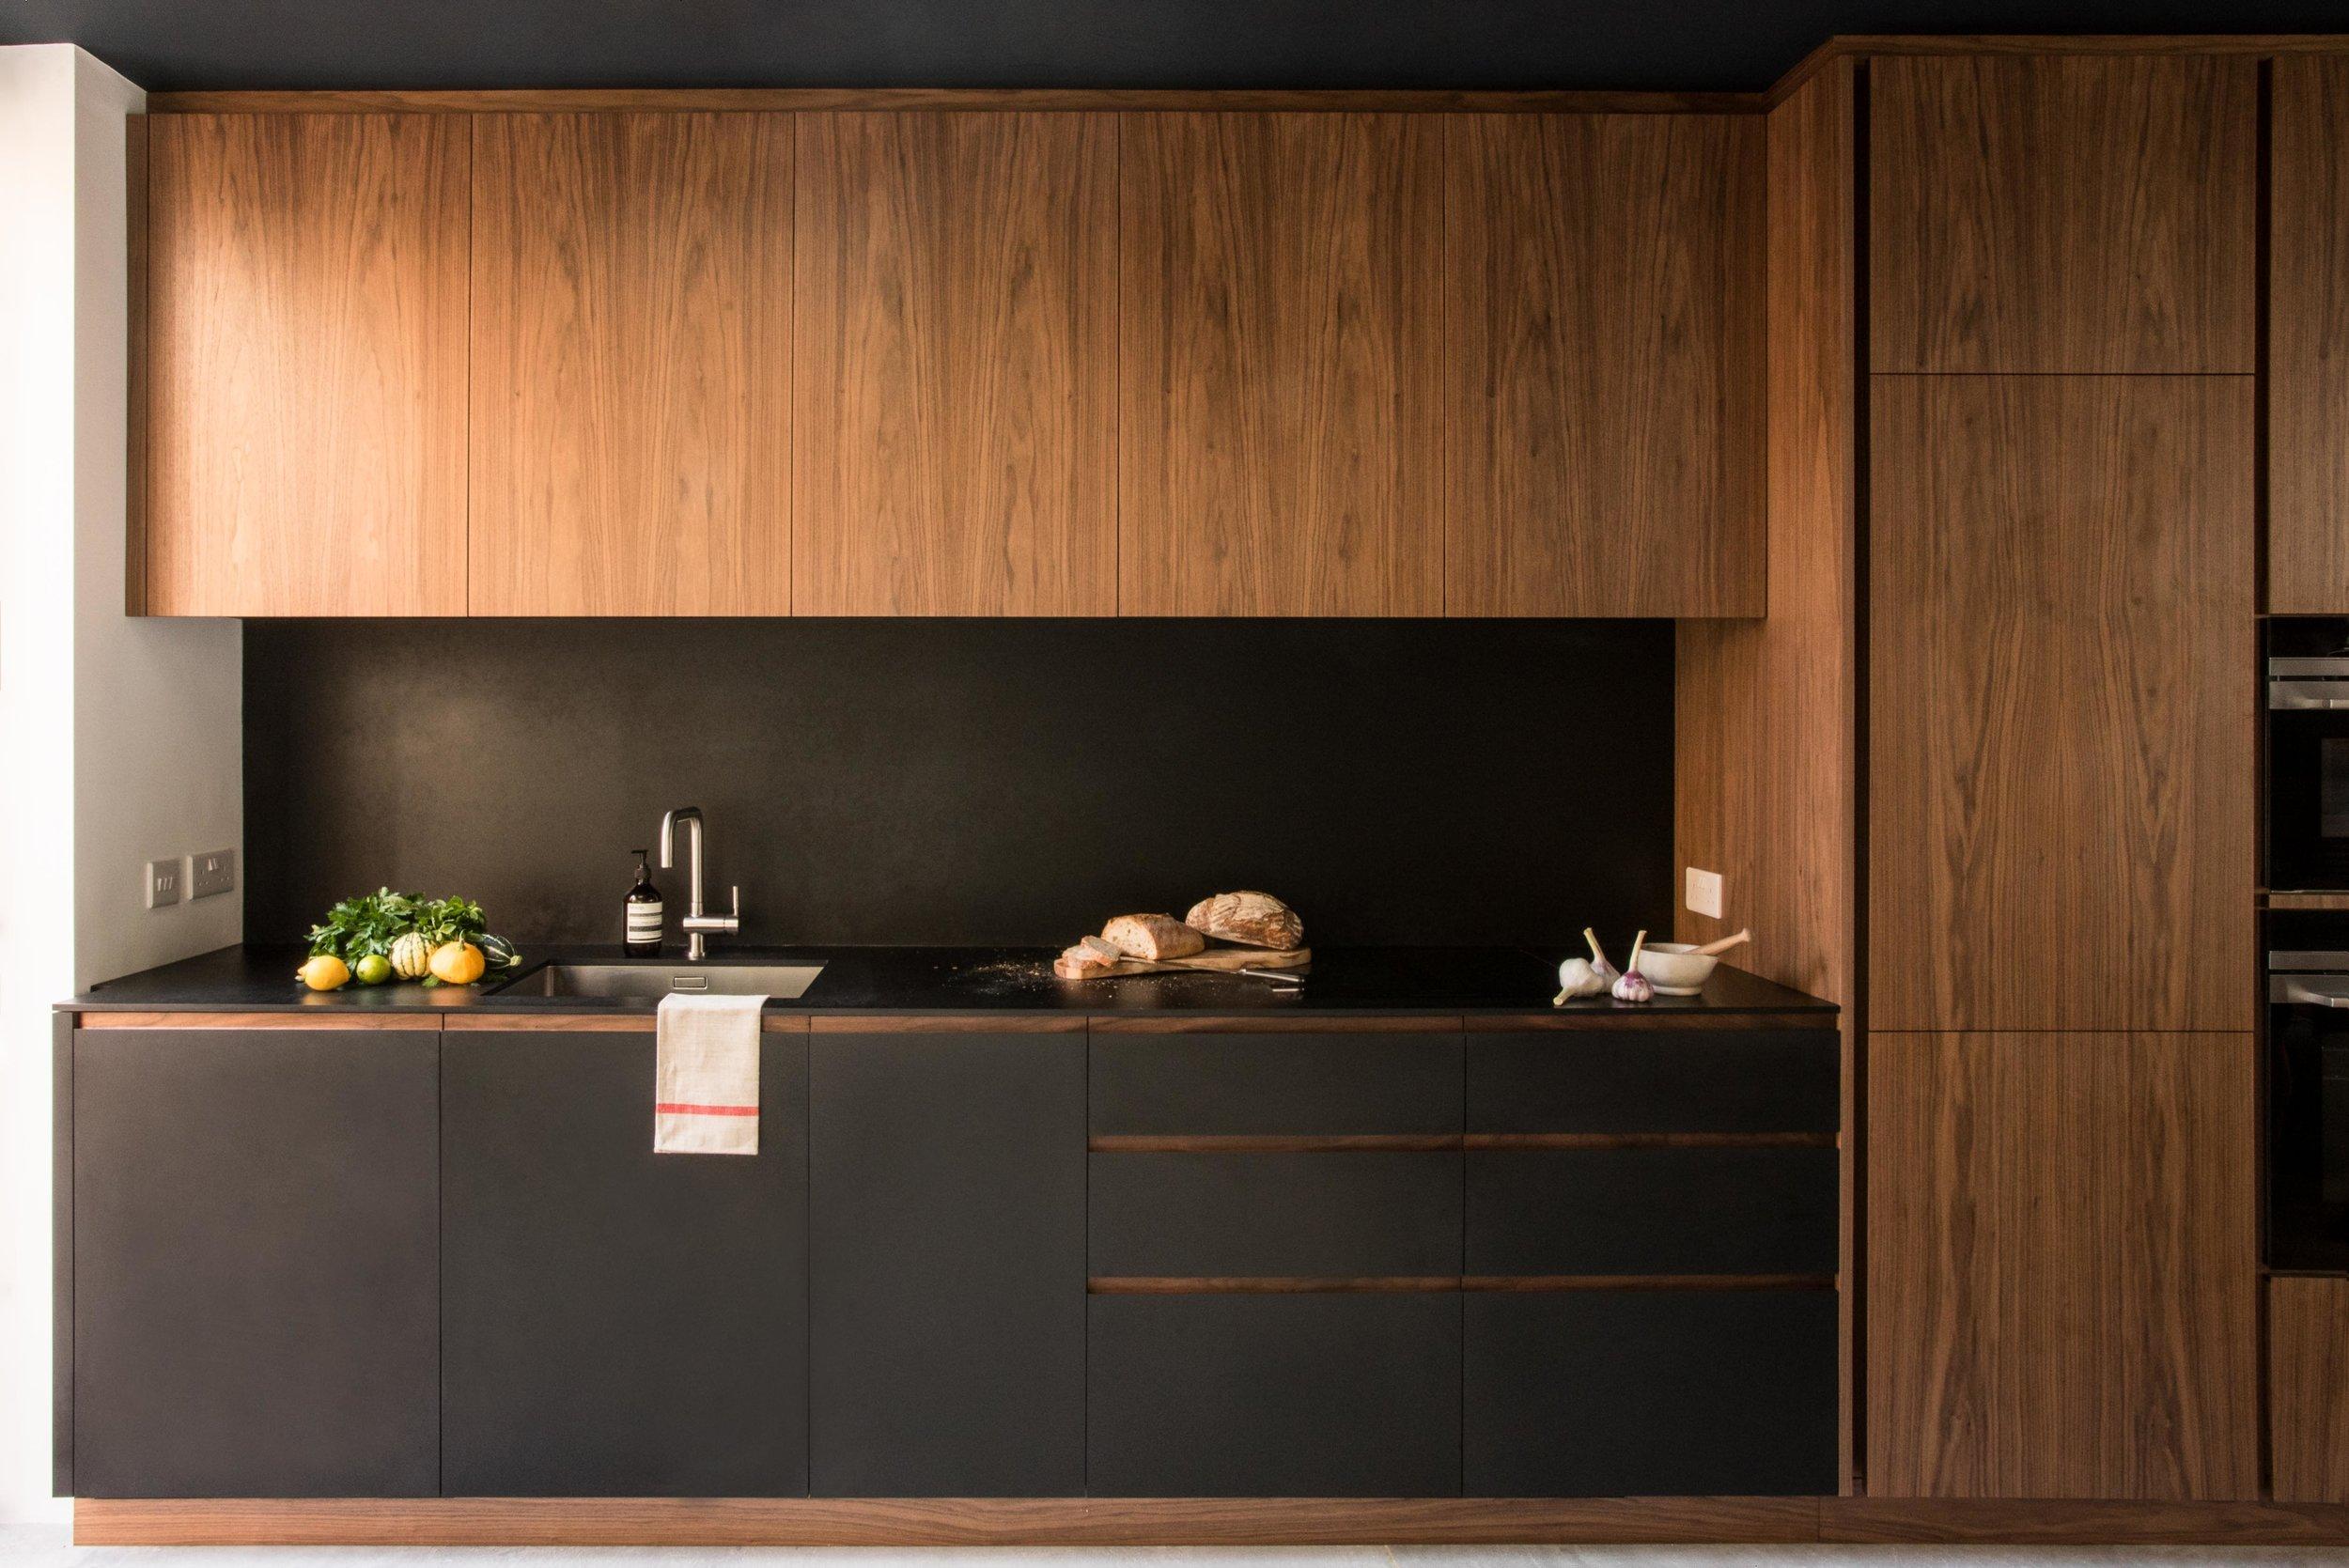 JT new Kitchen Edits SM1 (3 of 28).jpg